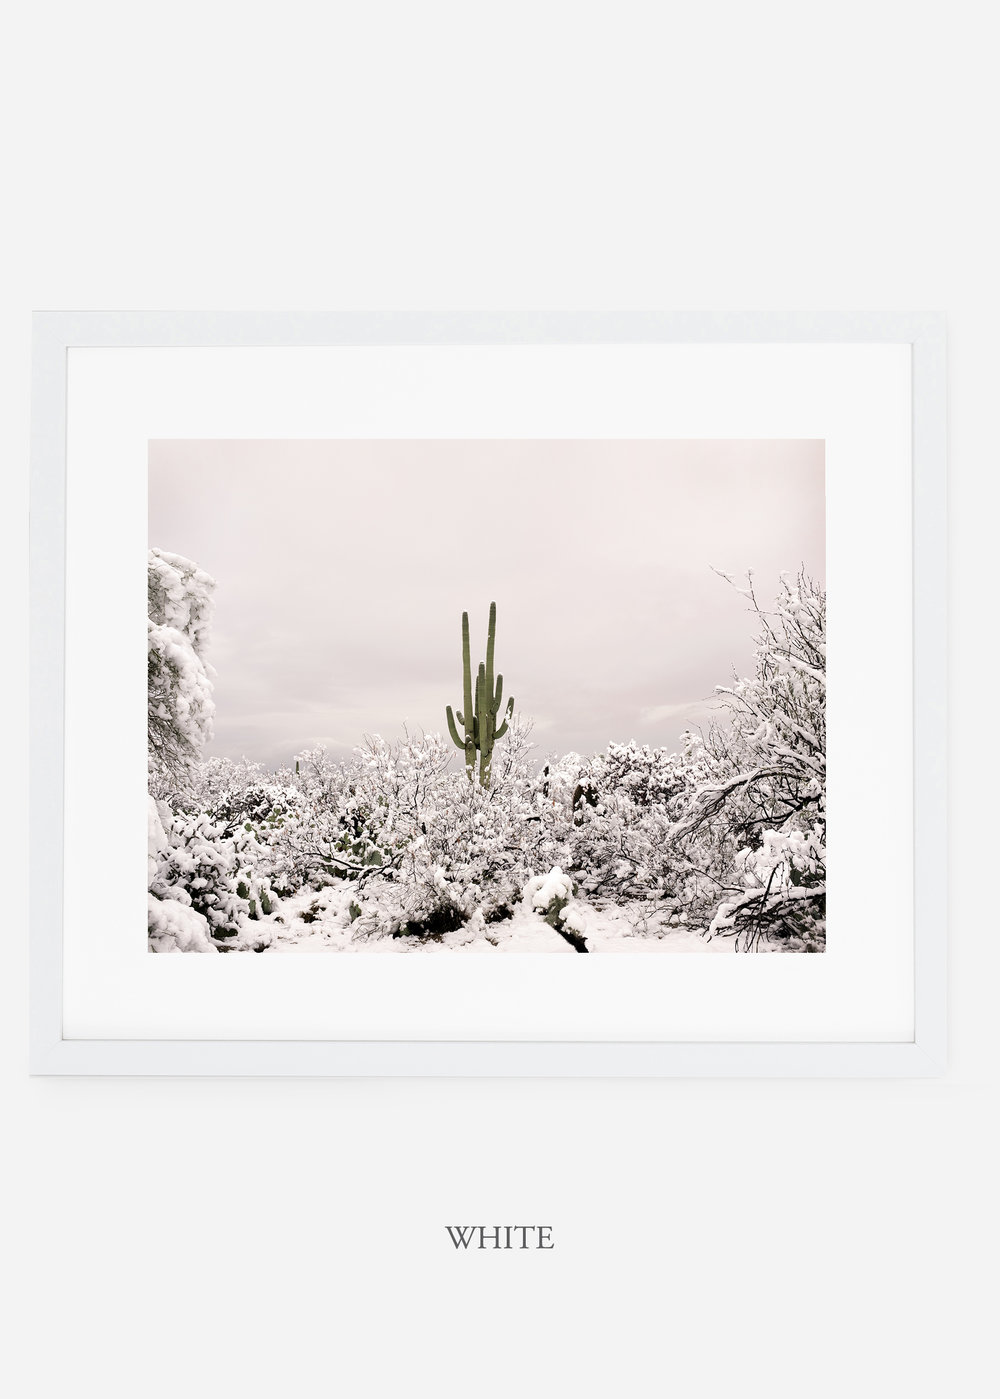 whiteframe-saguaroNo.1-wildercalifornia-art-wallart-cactusprint-homedecor-prints-arizona-botanical-artwork-interiordesign.jpg